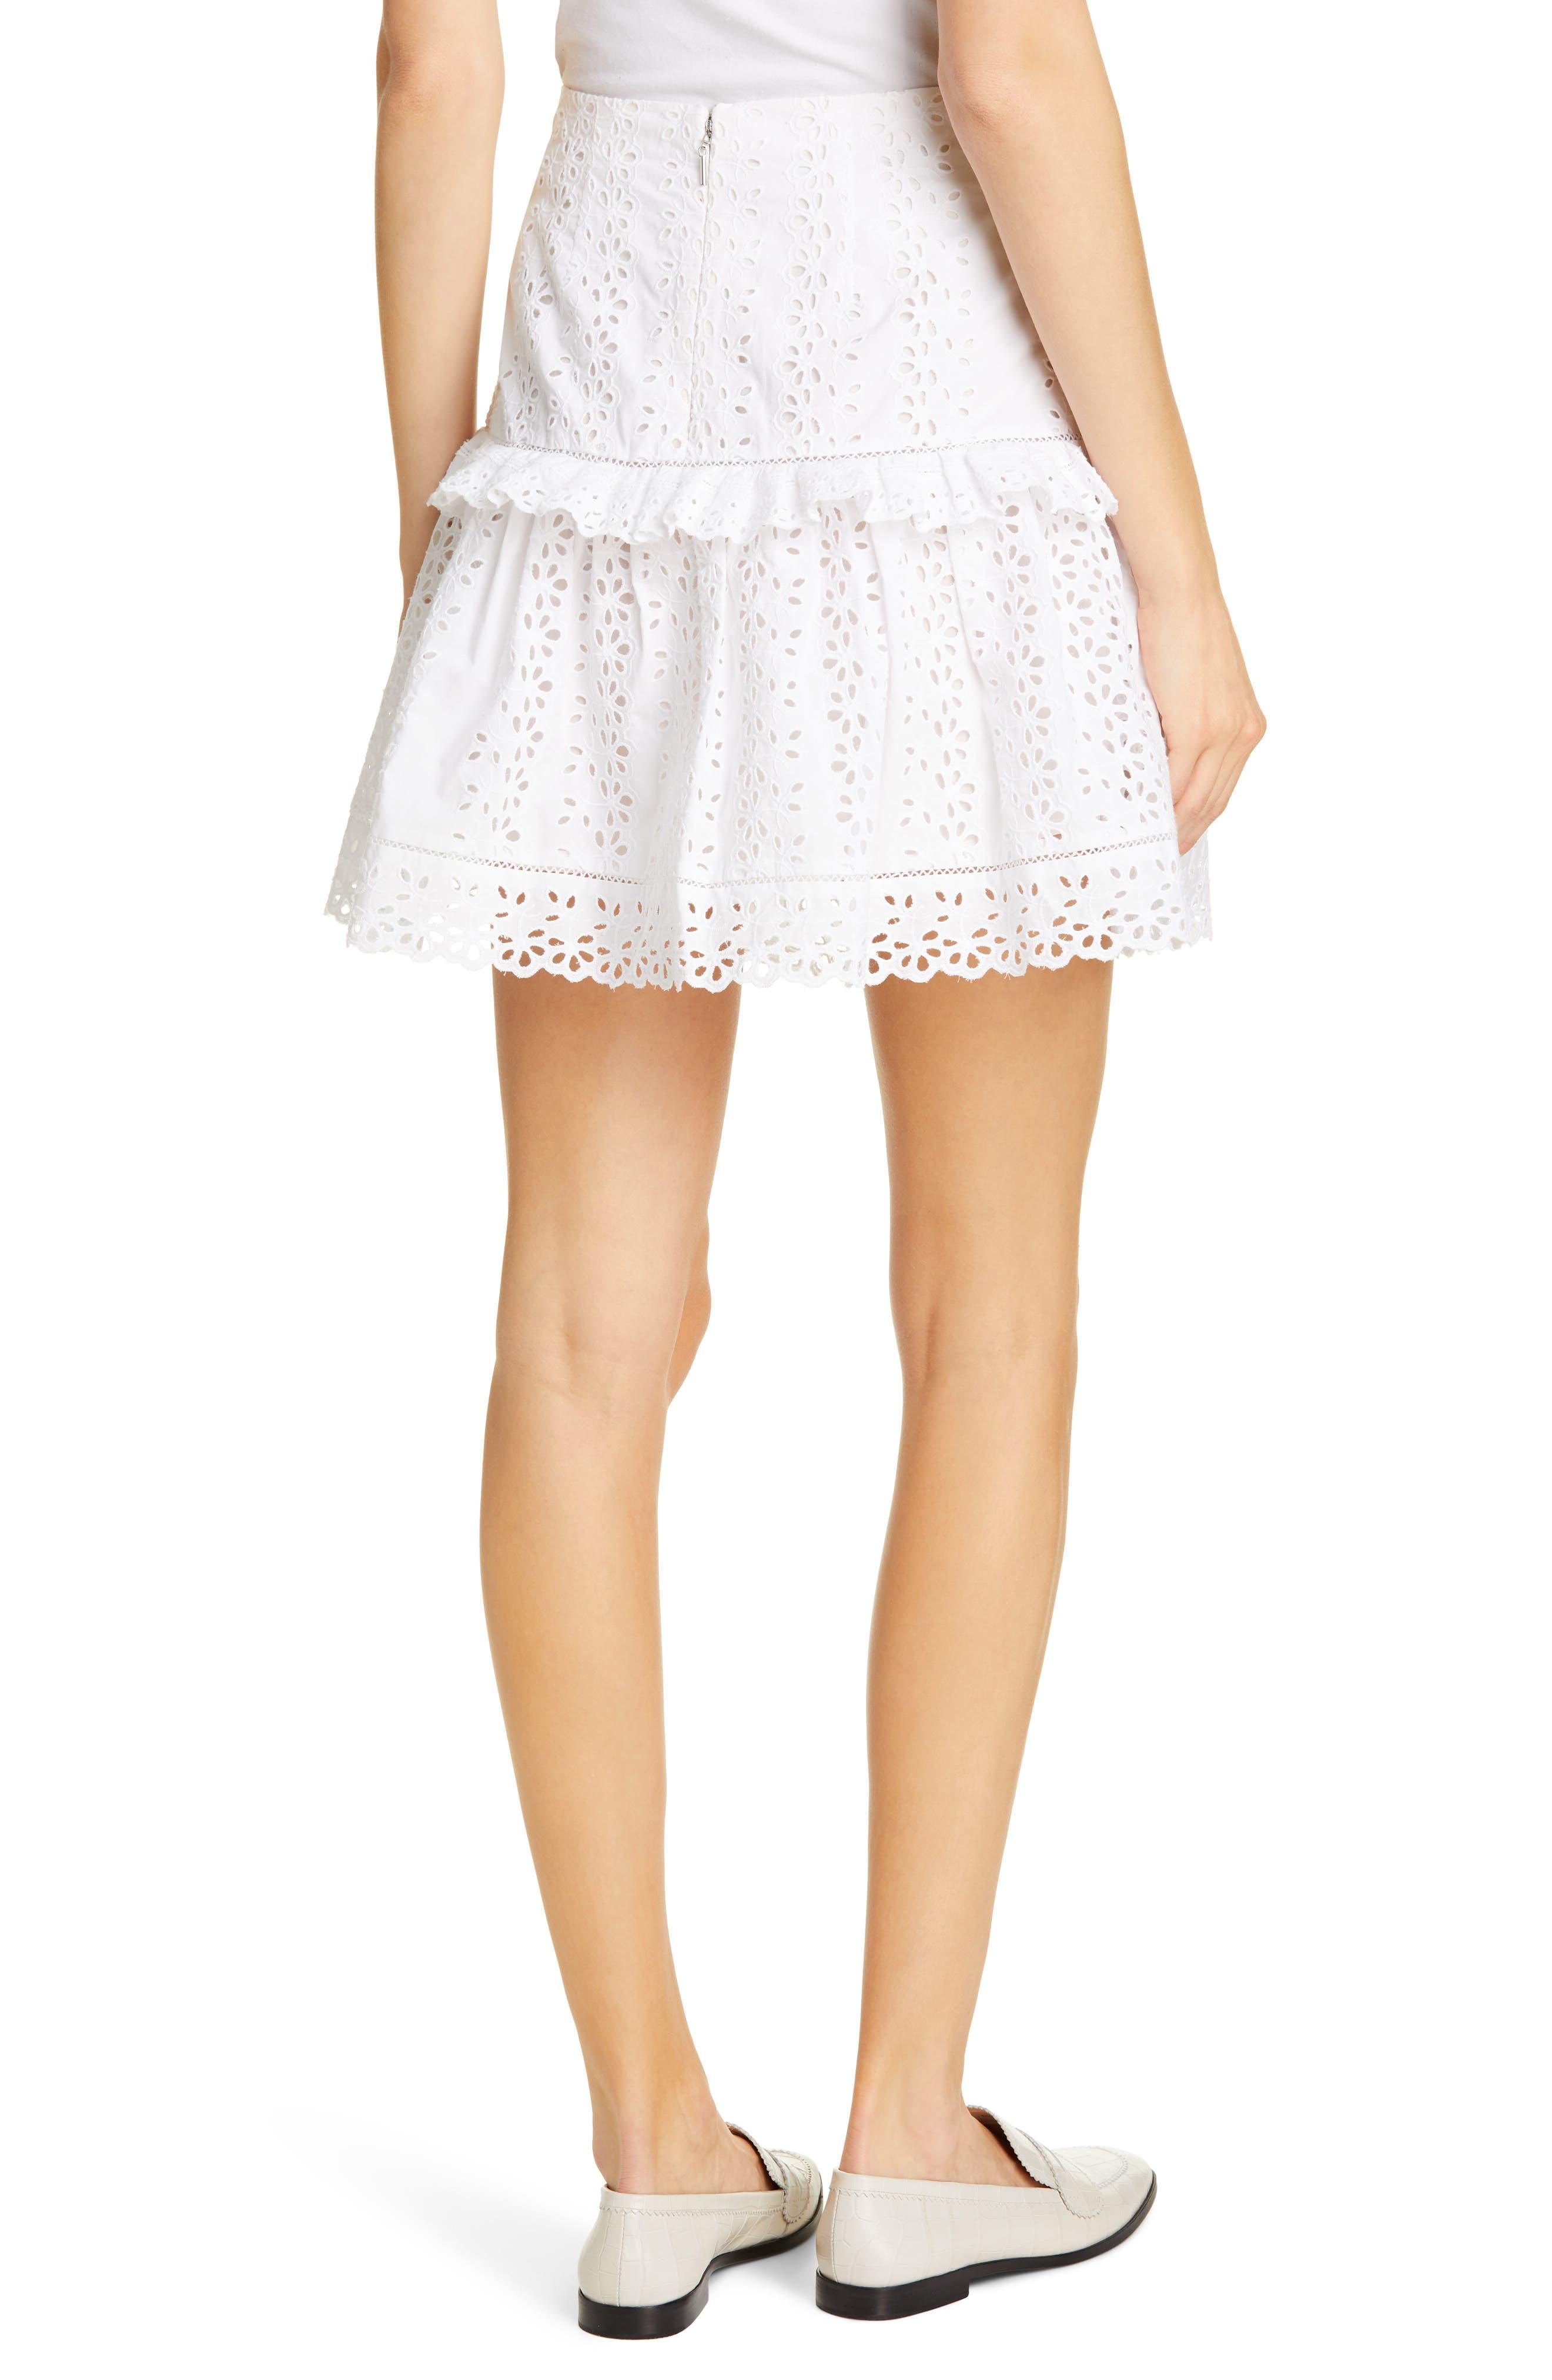 REBECCA TAYLOR, Karina Cotton Eyelet Skirt, Alternate thumbnail 2, color, MILK